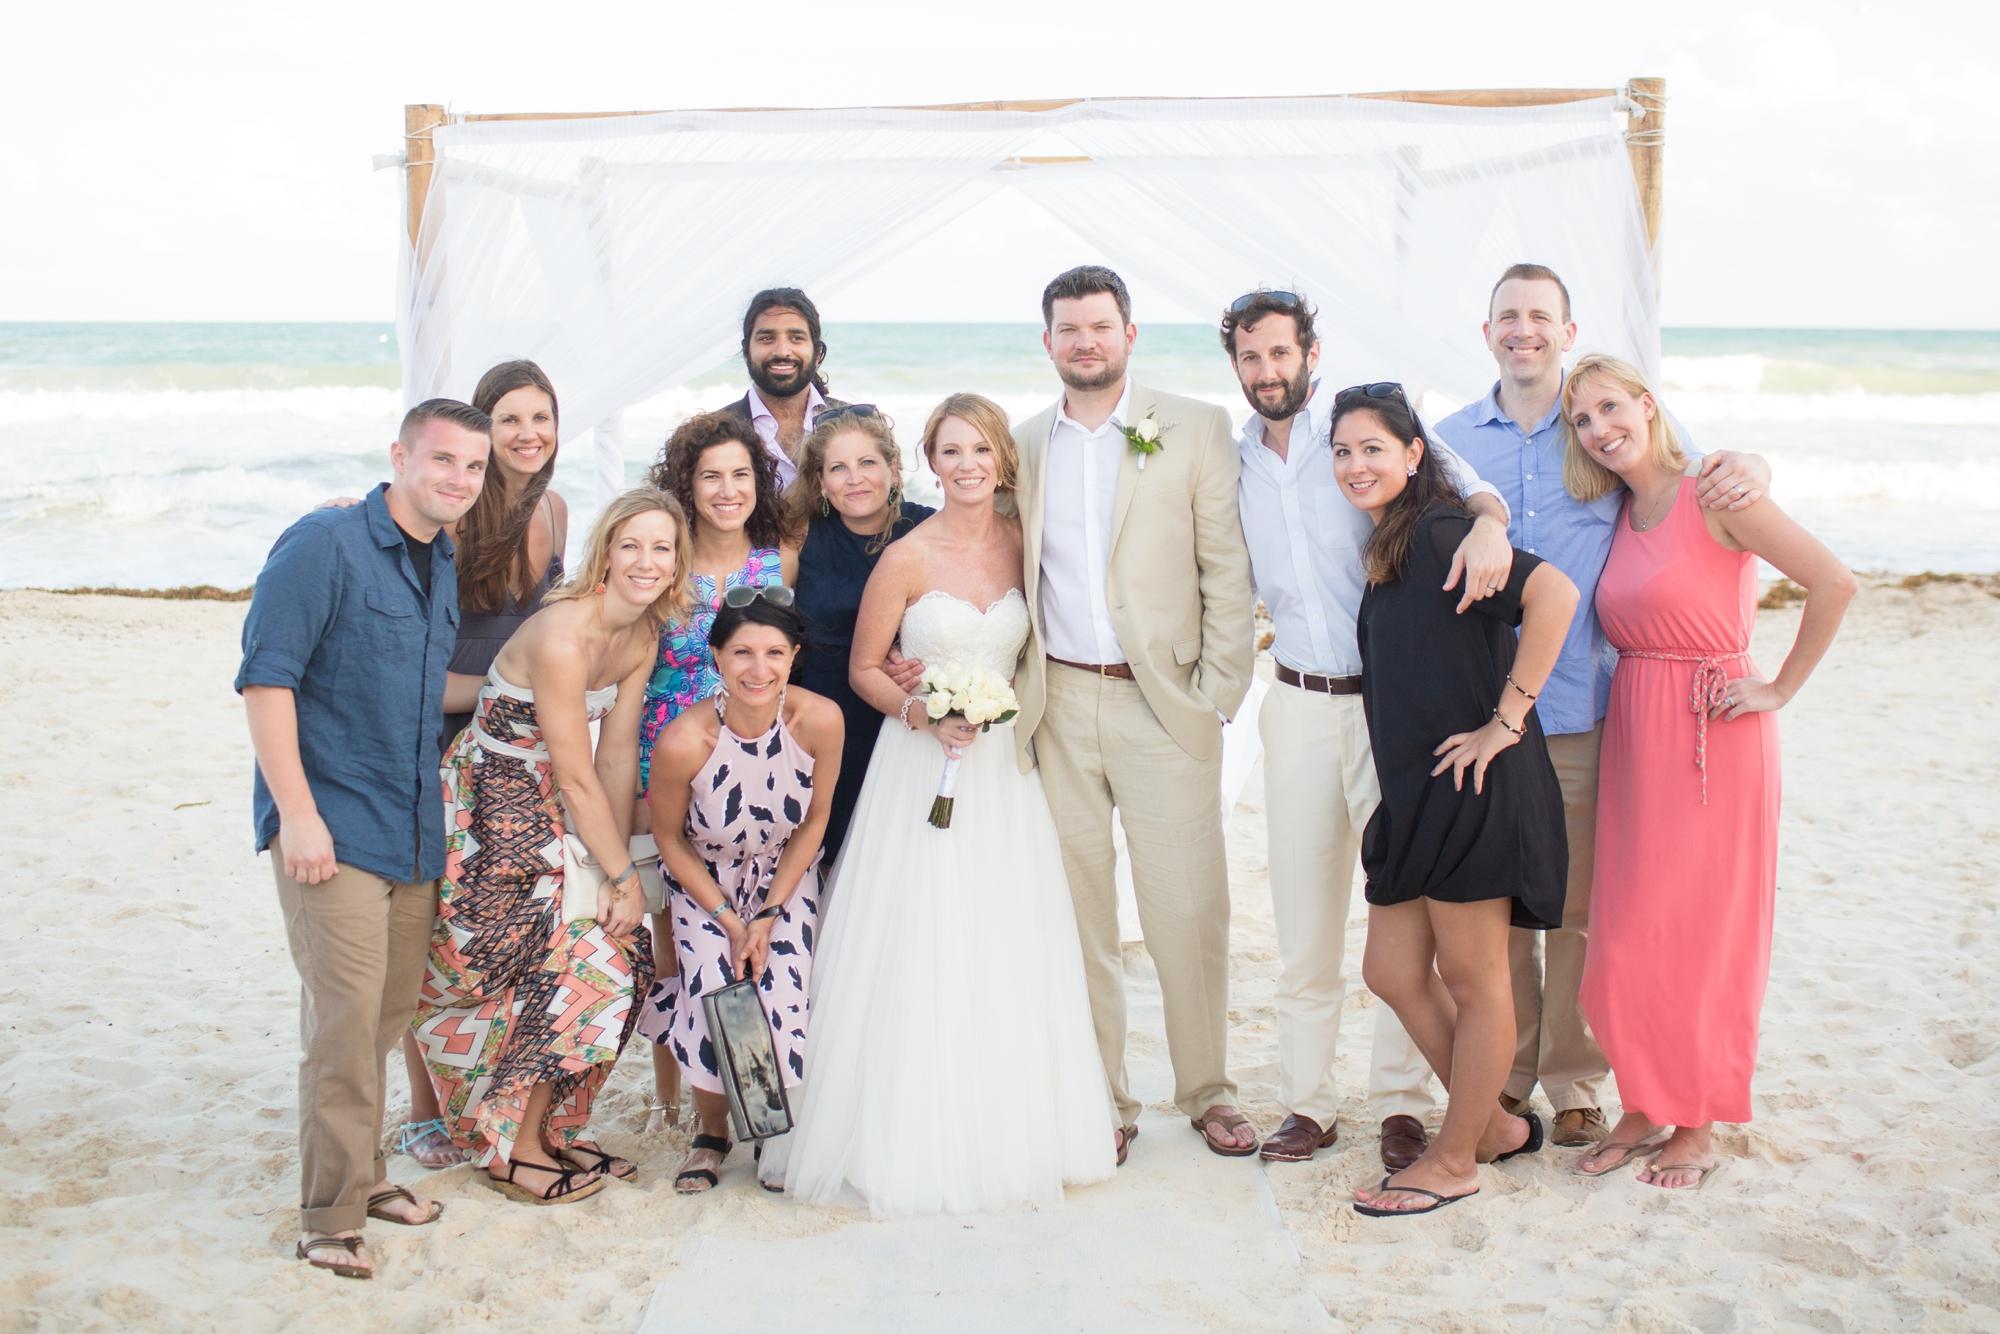 Morosoff Wedding 3-Family Formals-317_anna grace photography destination wedding photographer playa del carmen mexico photo.jpg